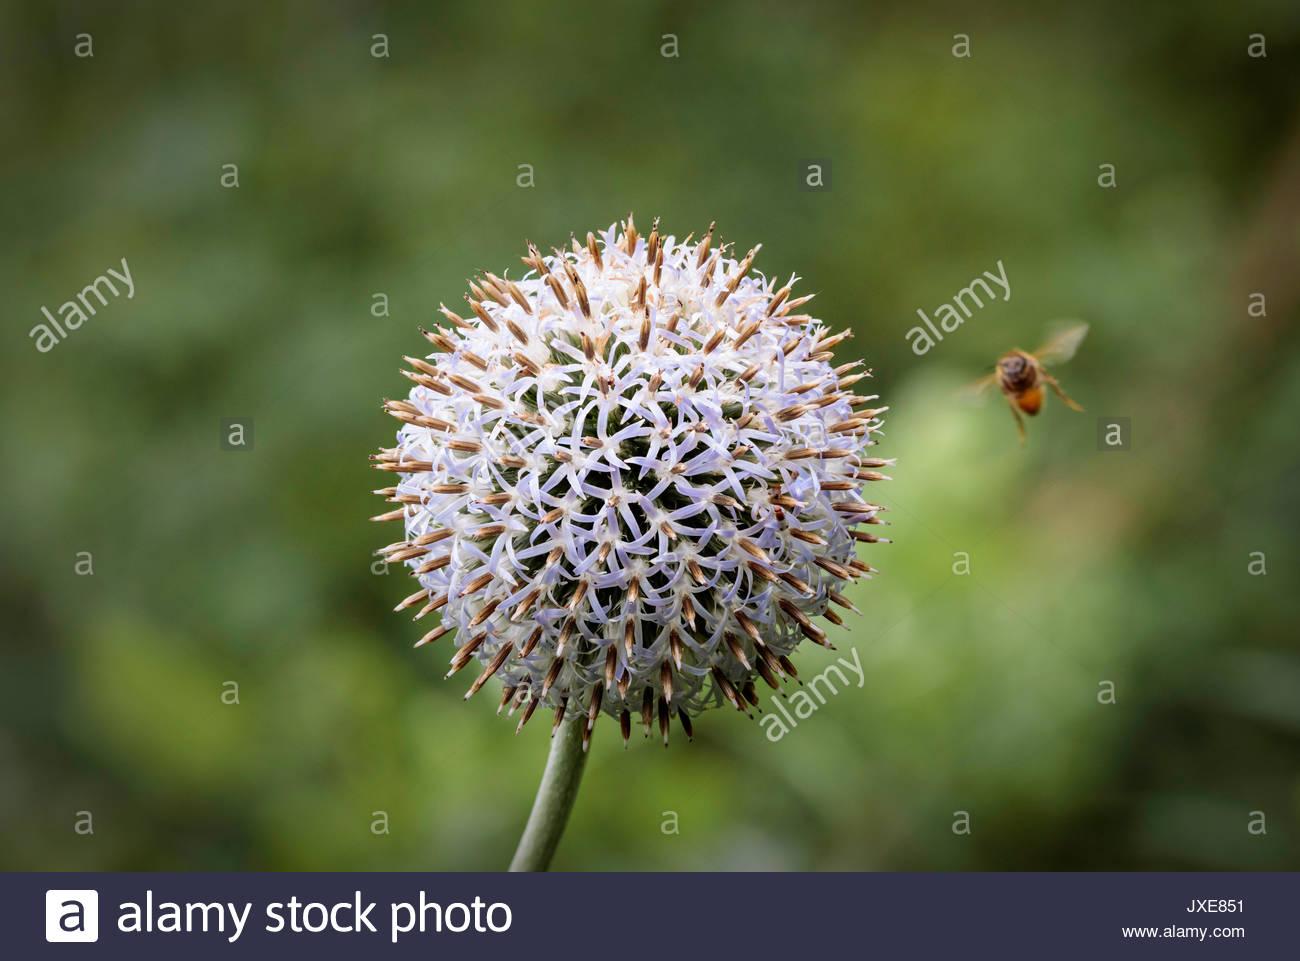 globe-thistle globe thistle flower glandular woolly perennial herbaceous spherical inflorescence Asteraceae - Stock Image